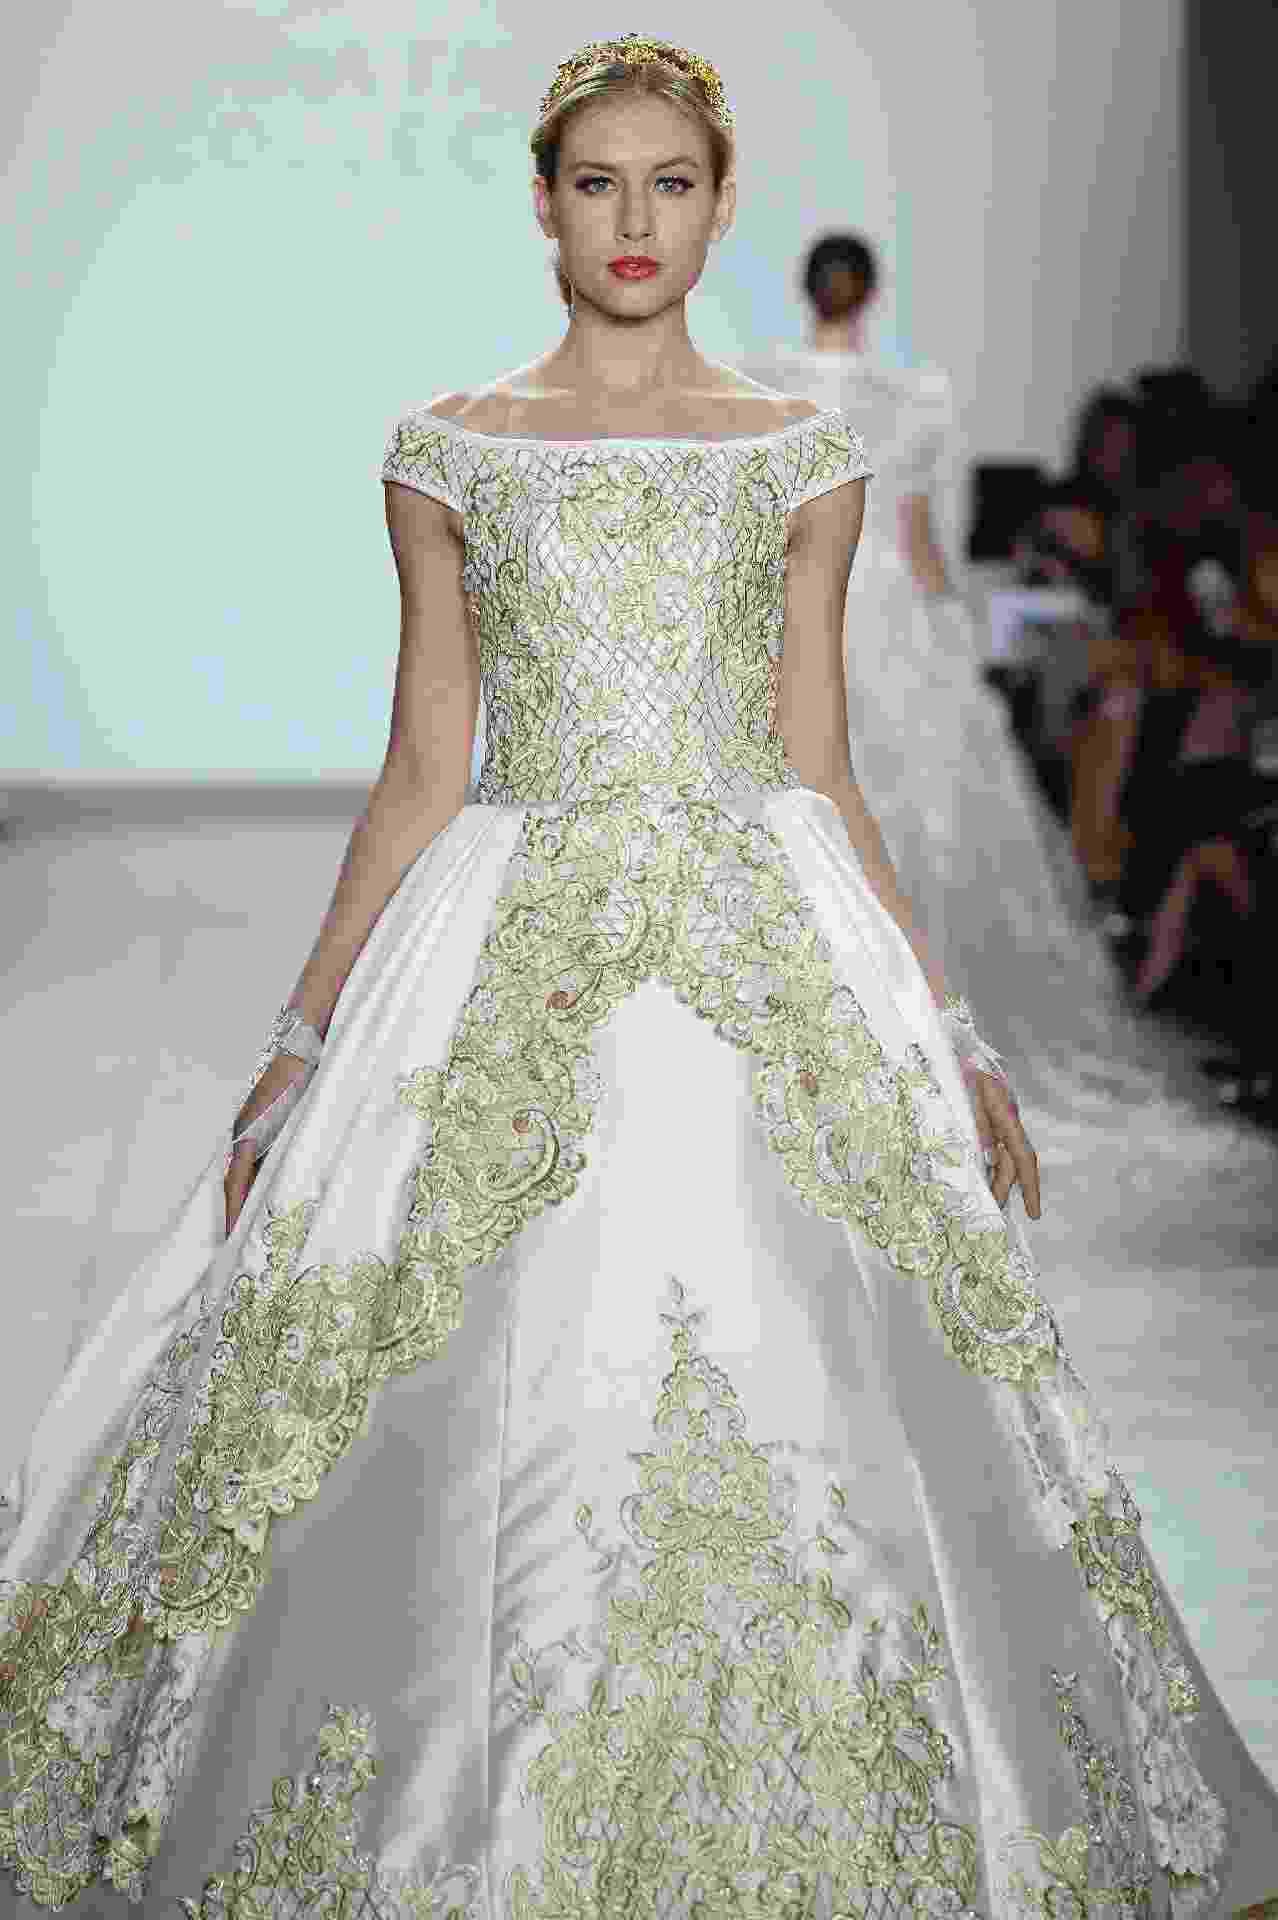 Semana de Moda de NY - China Fashion - Getty Images